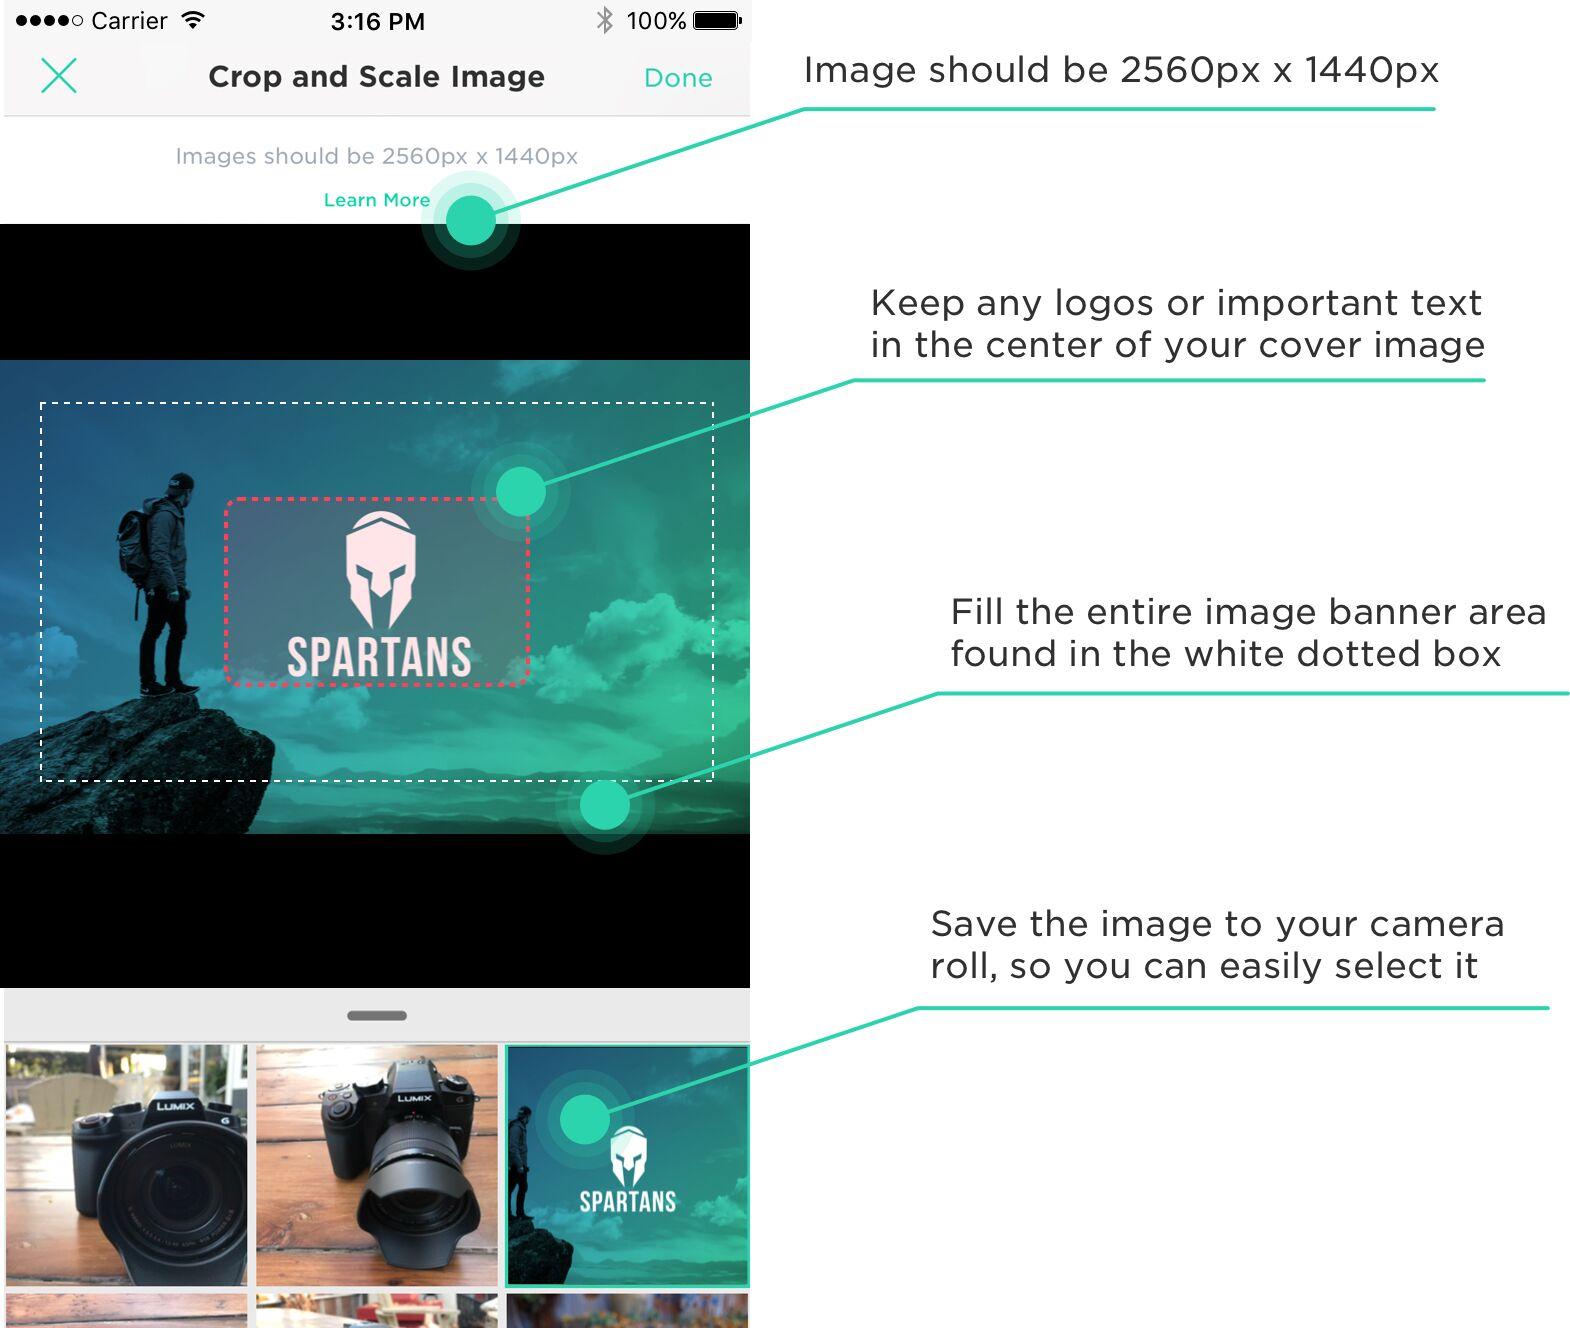 Communities custom cover image instructions